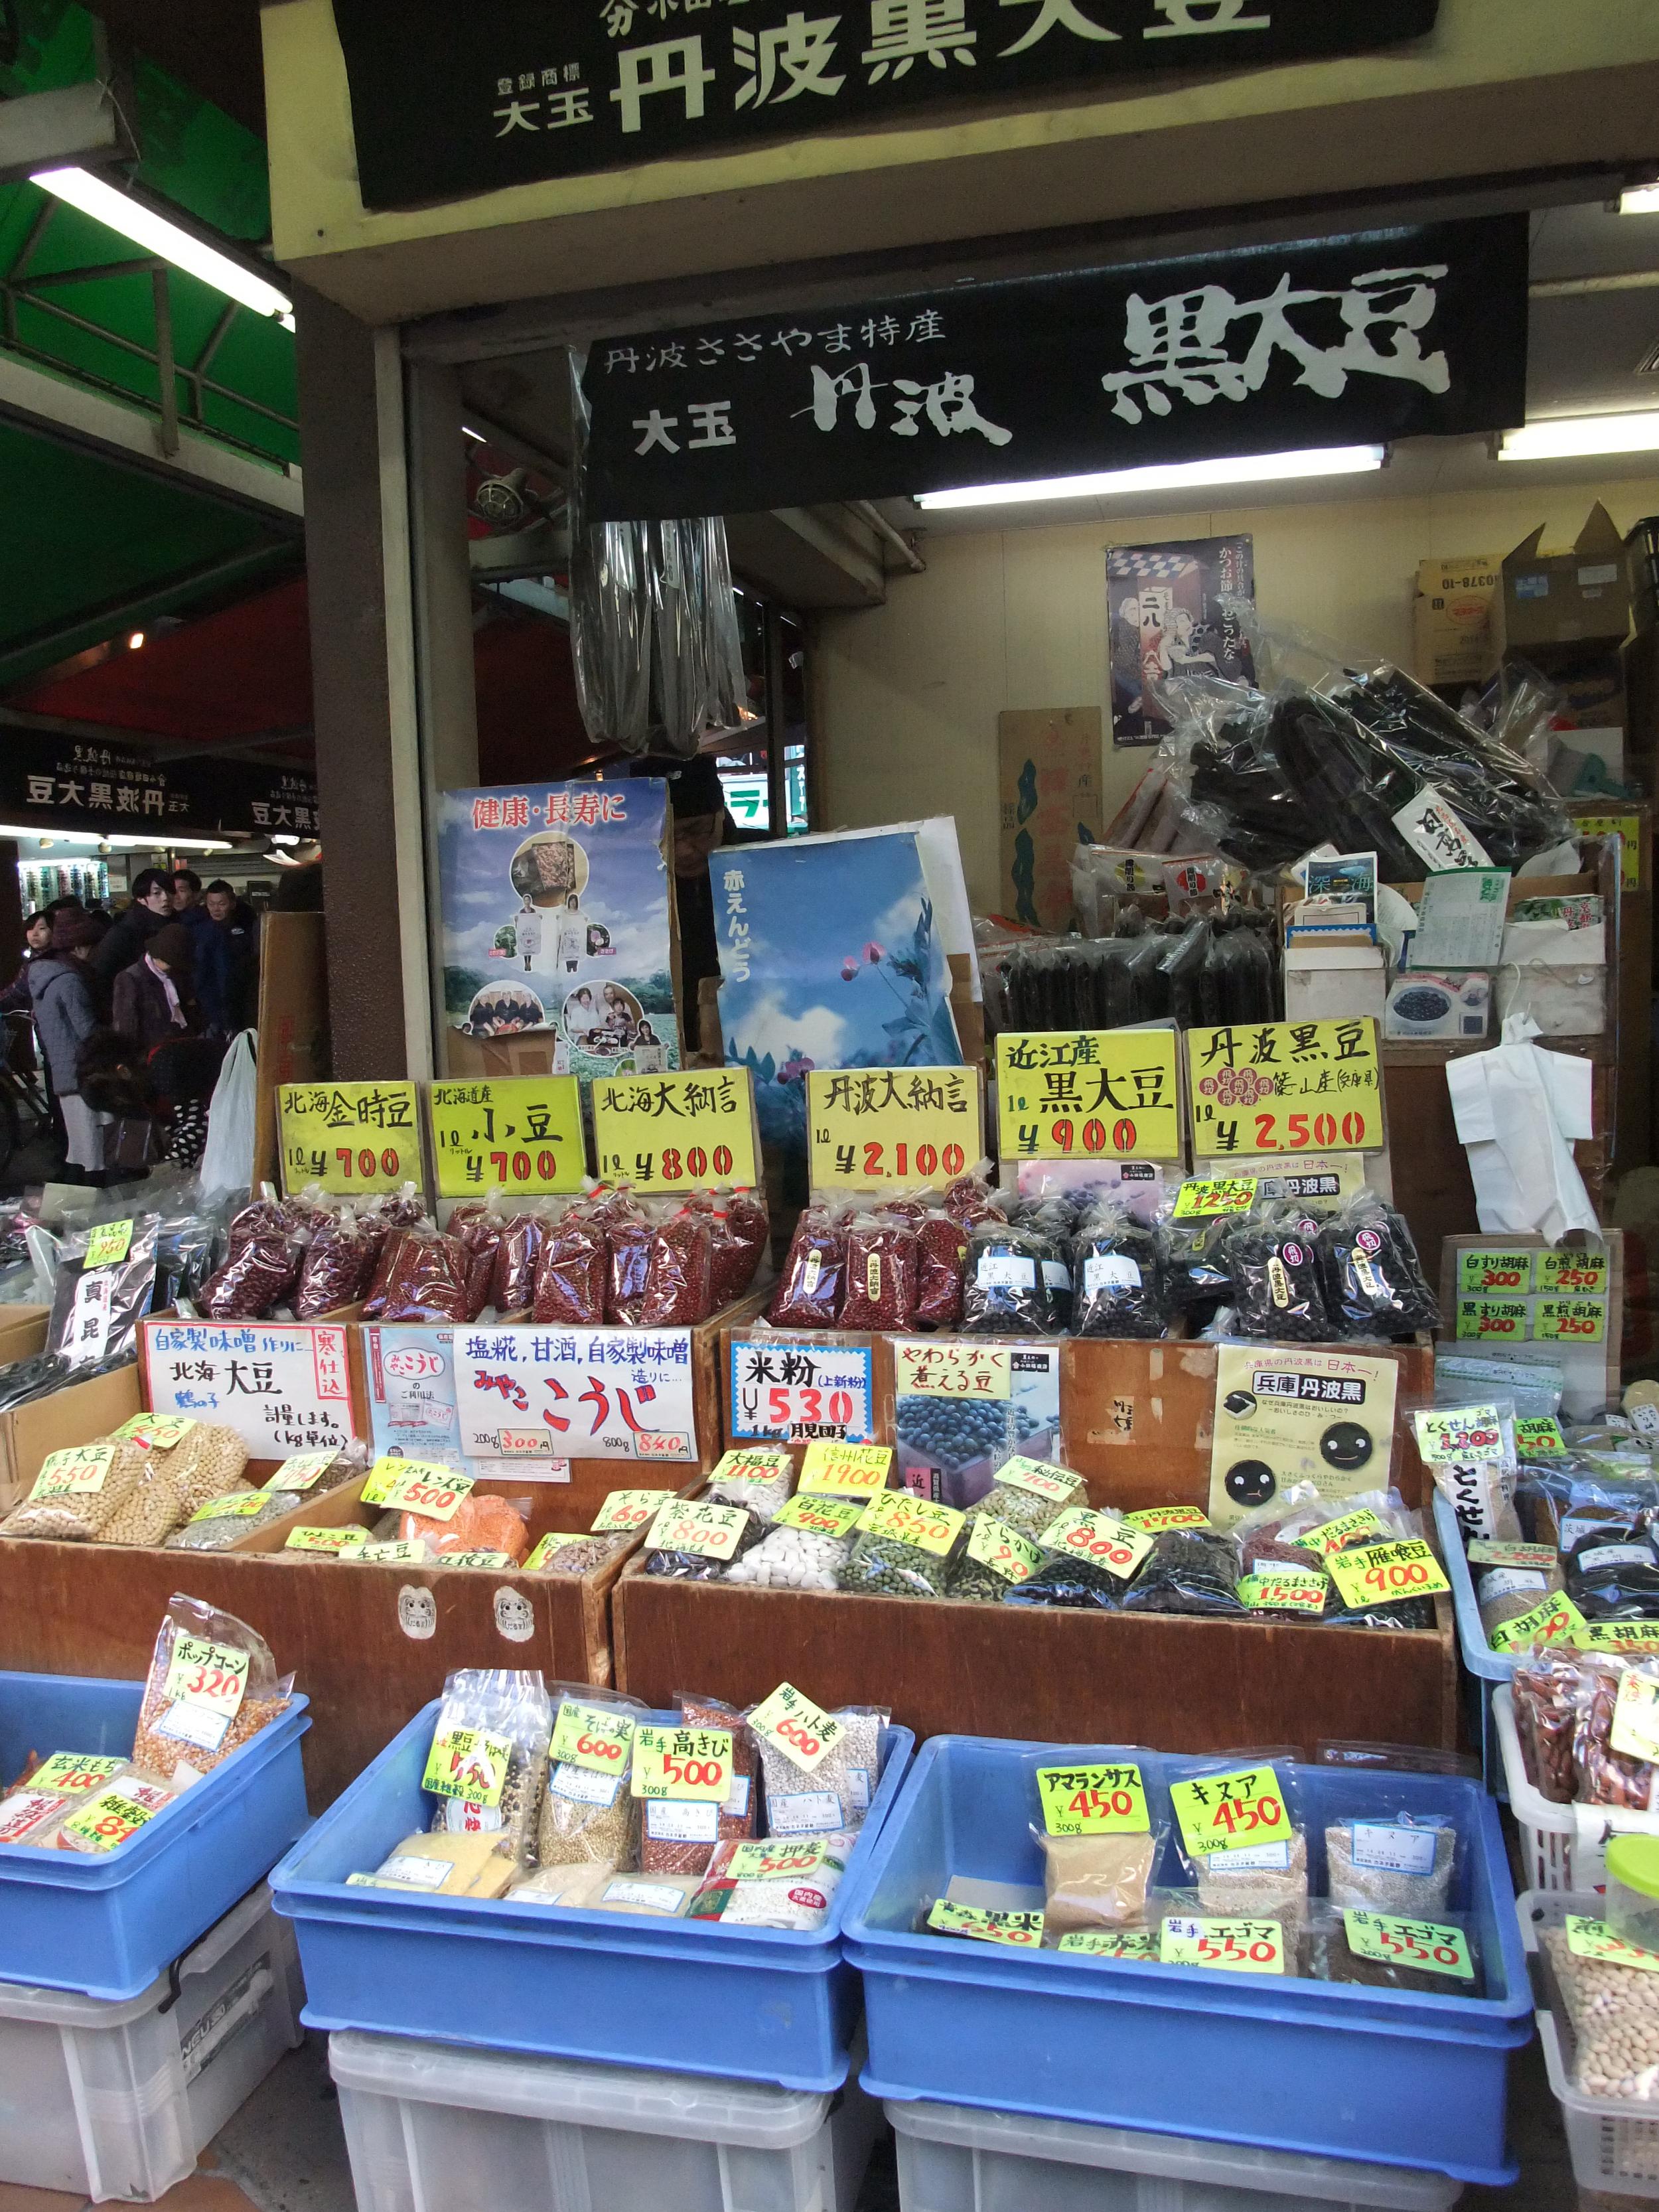 Shops in Ueno